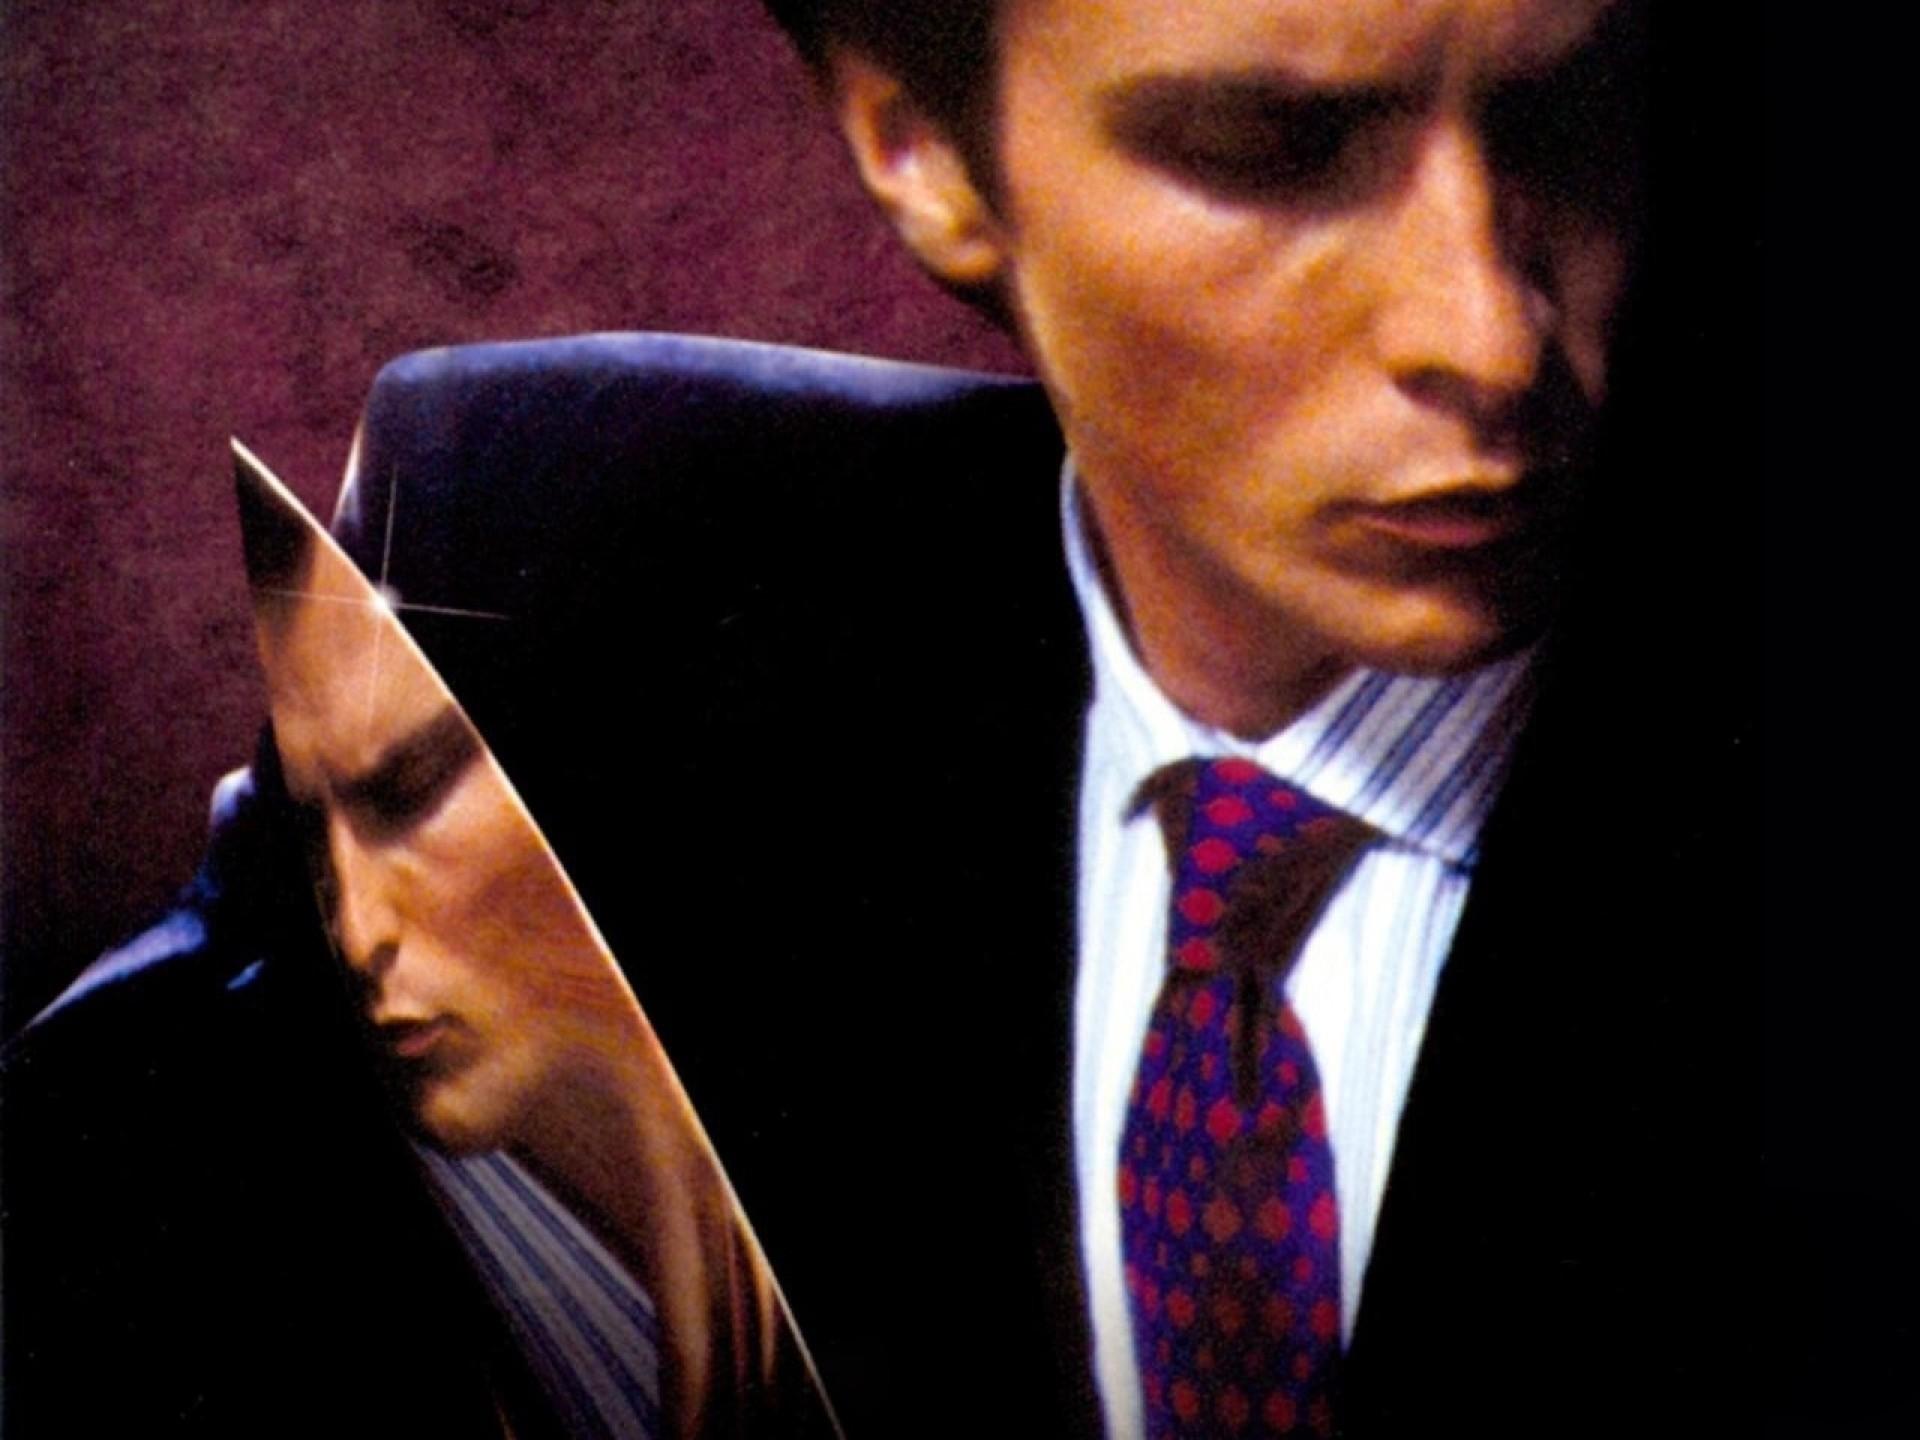 american psycho christian bale patrick bateman 1280×960 wallpaper Art HD  Wallpaper